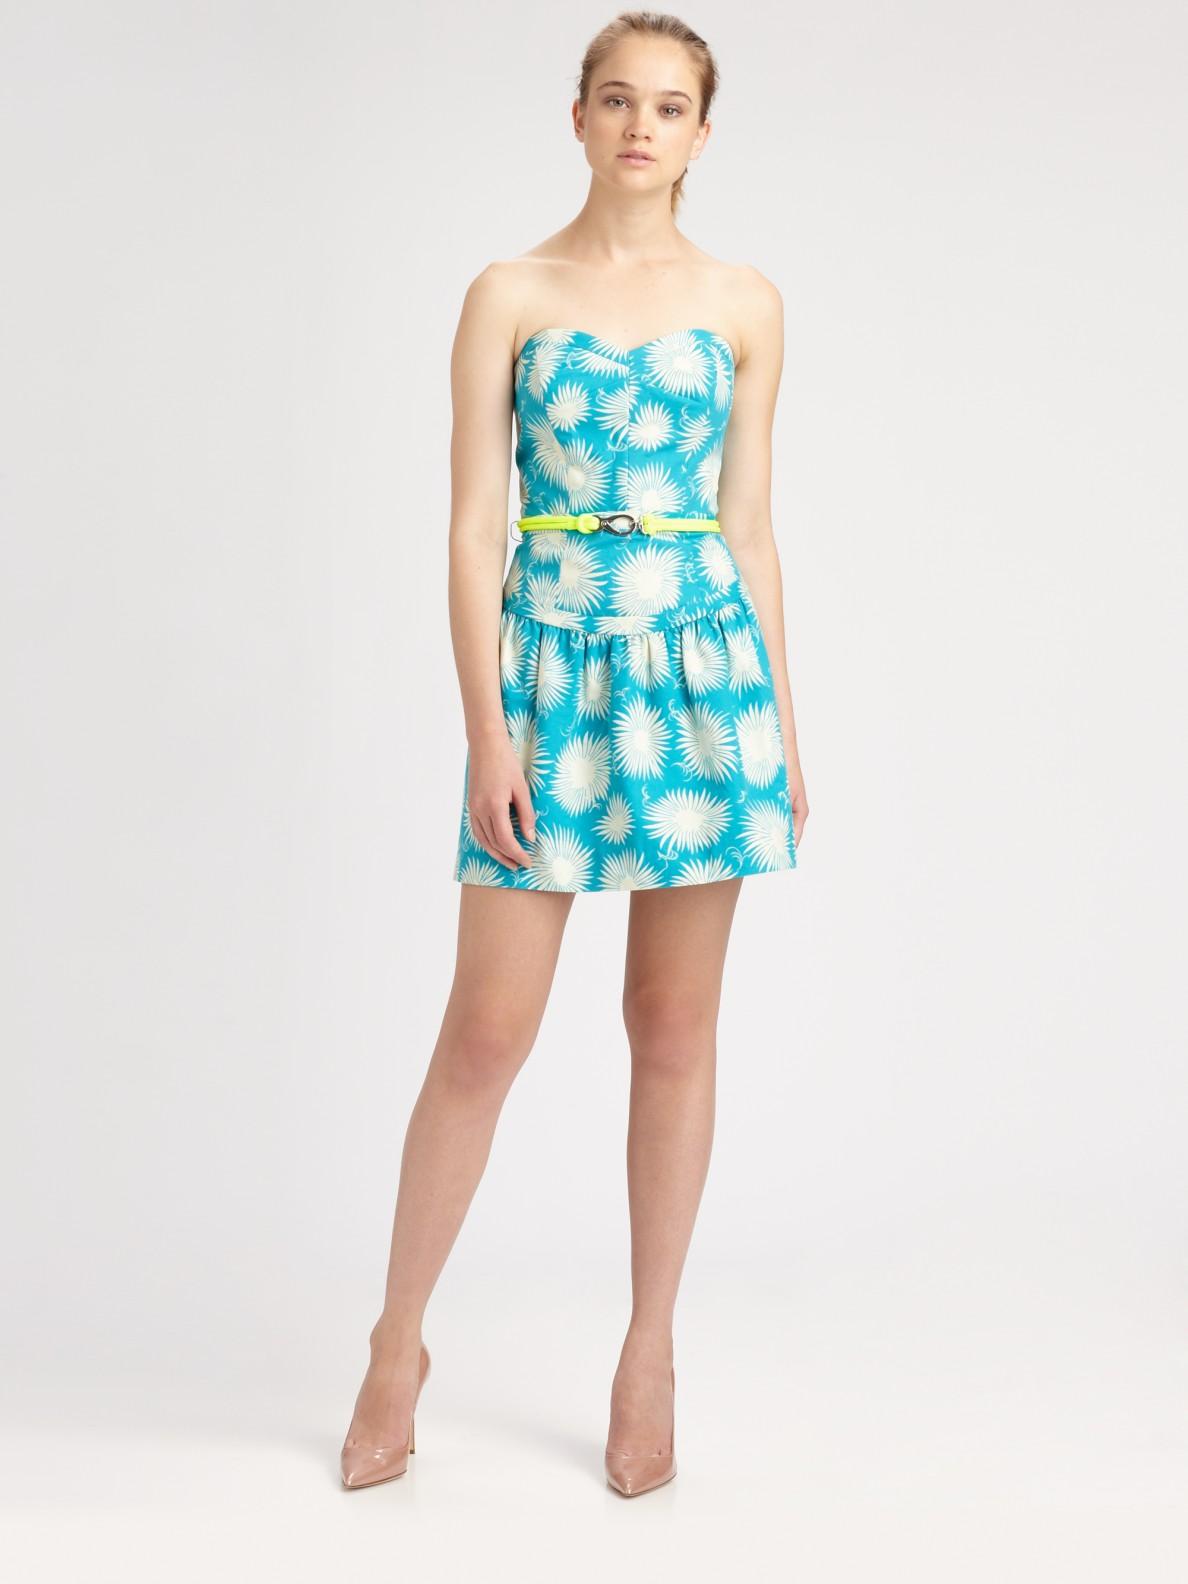 Aqua Strapless Dress